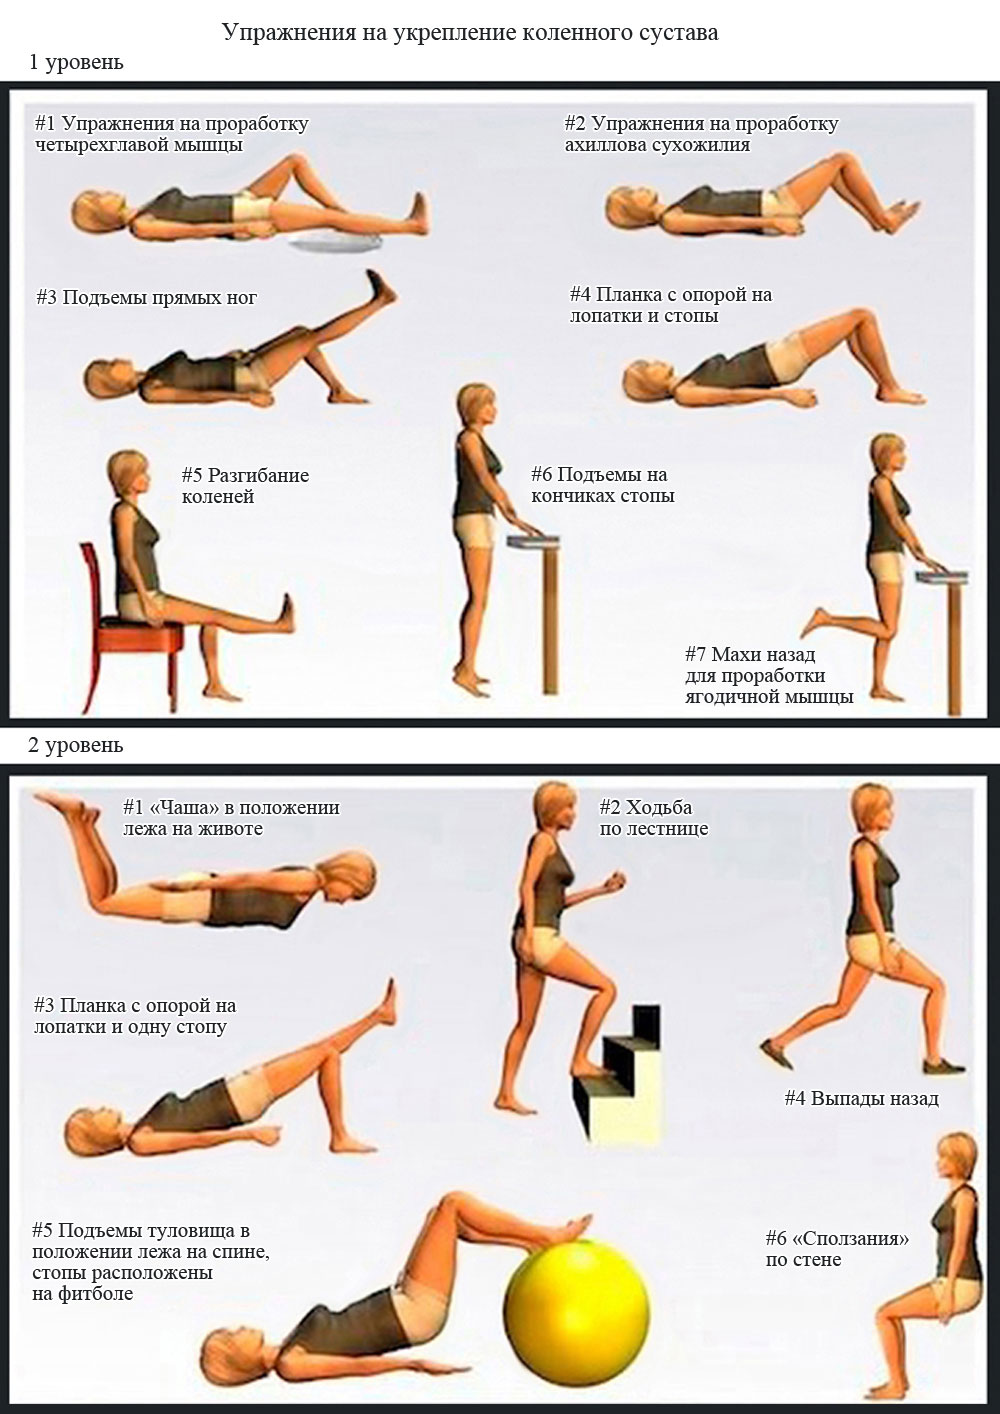 Упражнения для реабилитации коленного сустава квота при операции по замене коленного сустава